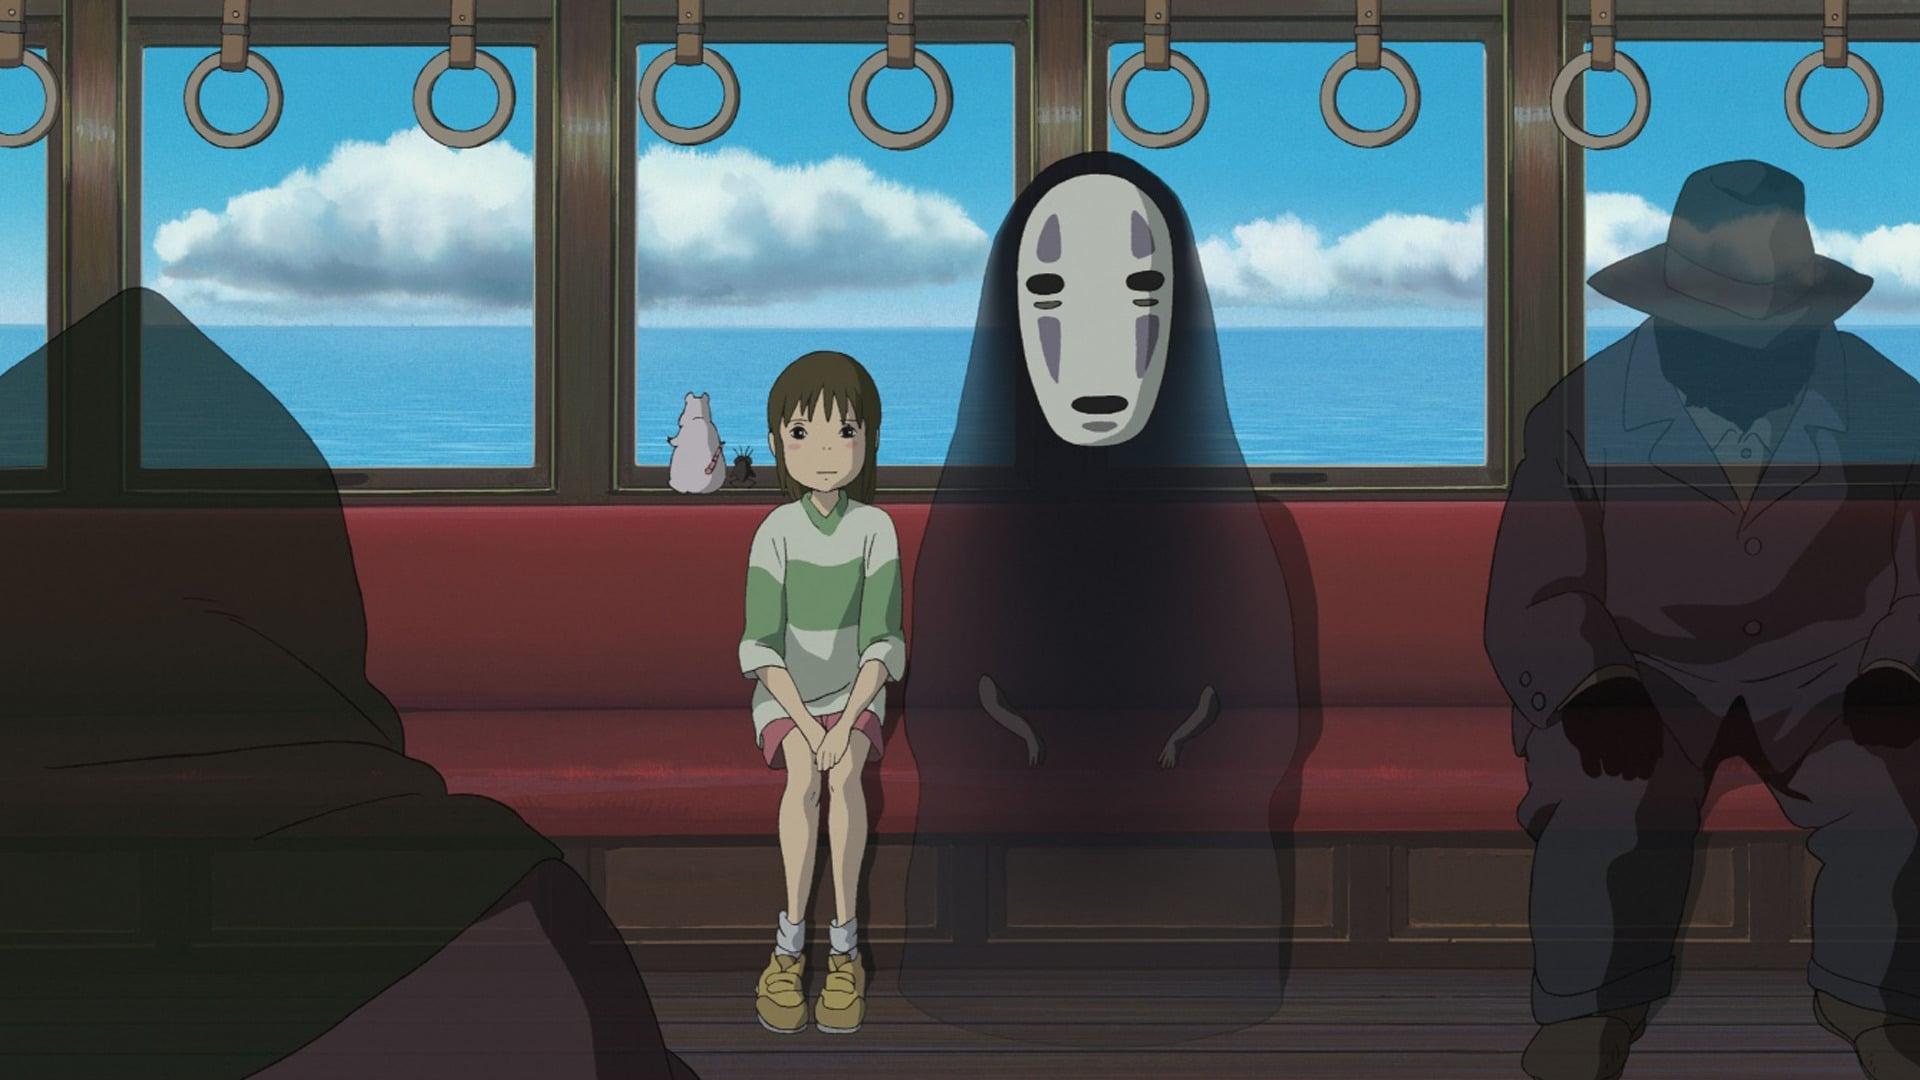 La città incantata, Miyazaki, Credits: Studio Ghibli